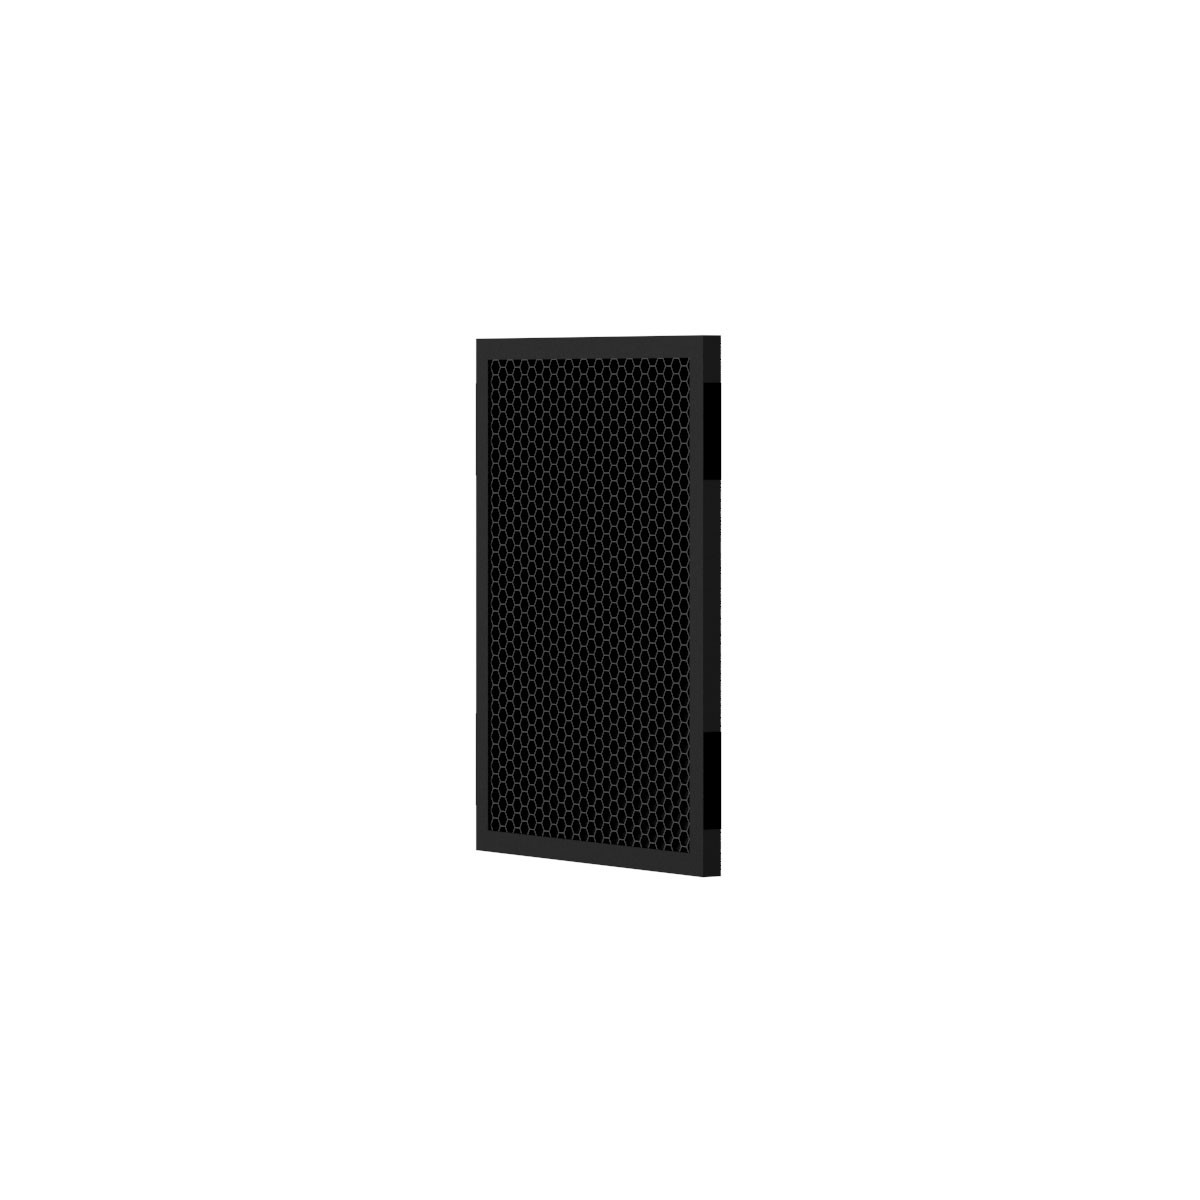 Colmeia para softbox spot 30 x 40